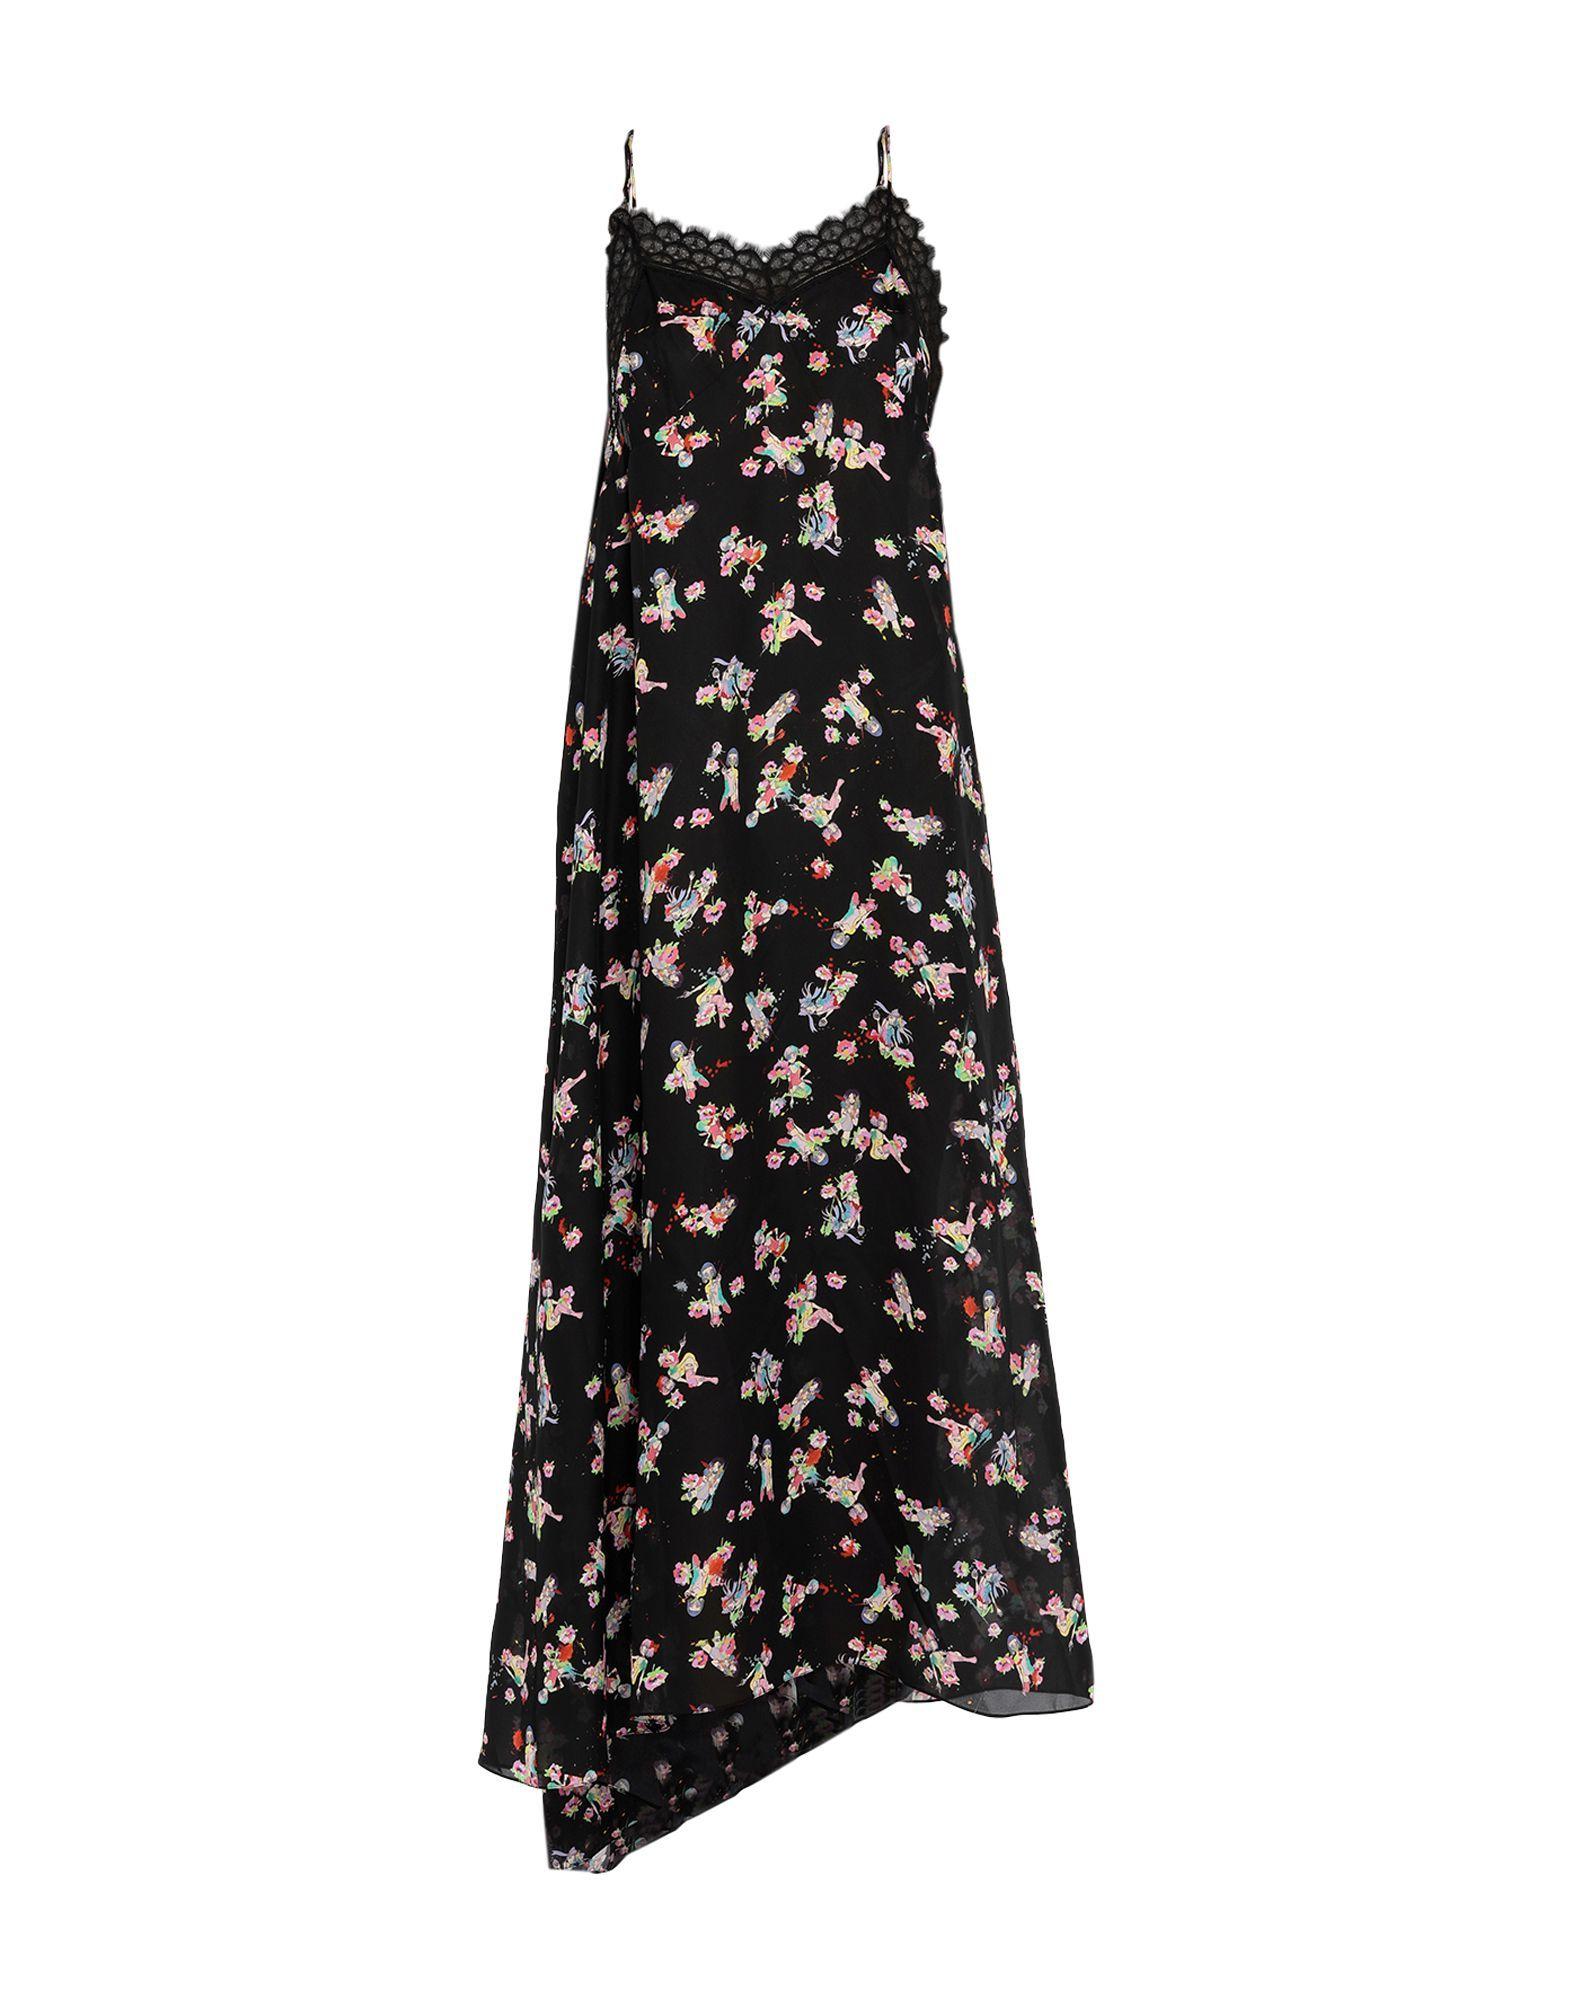 DRESSES Woman Maison Margiela Black Silk